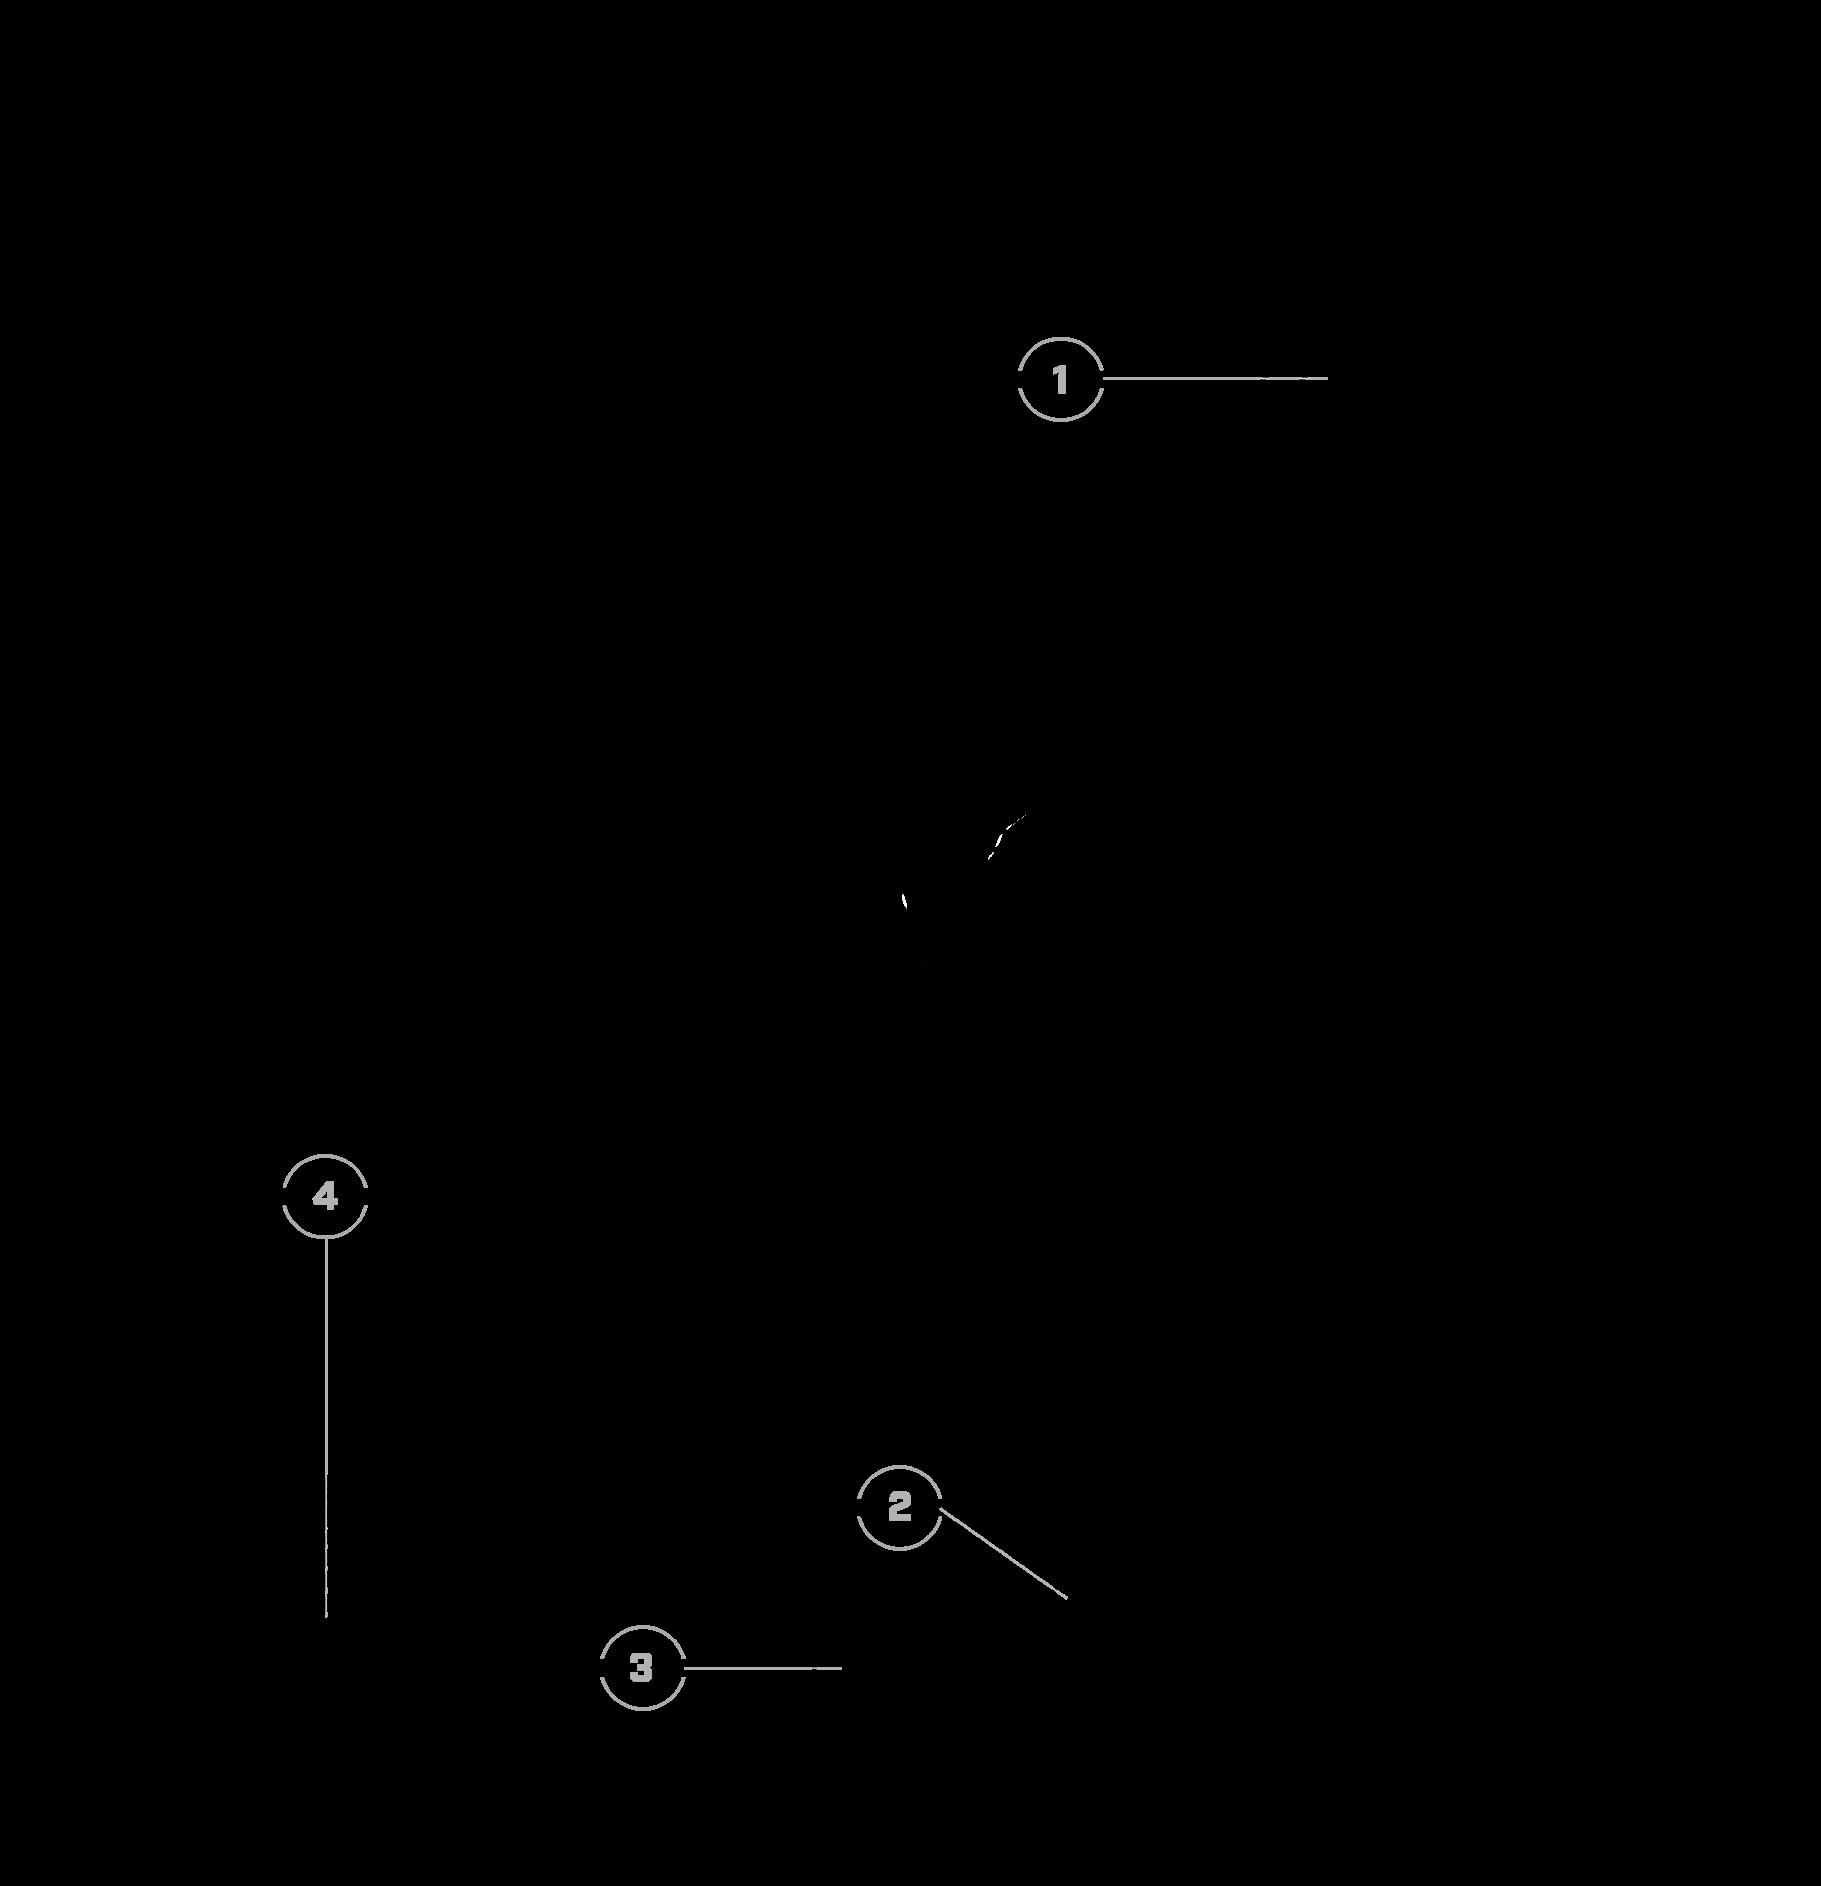 Мультитул - фонарик SOG Baton Q2